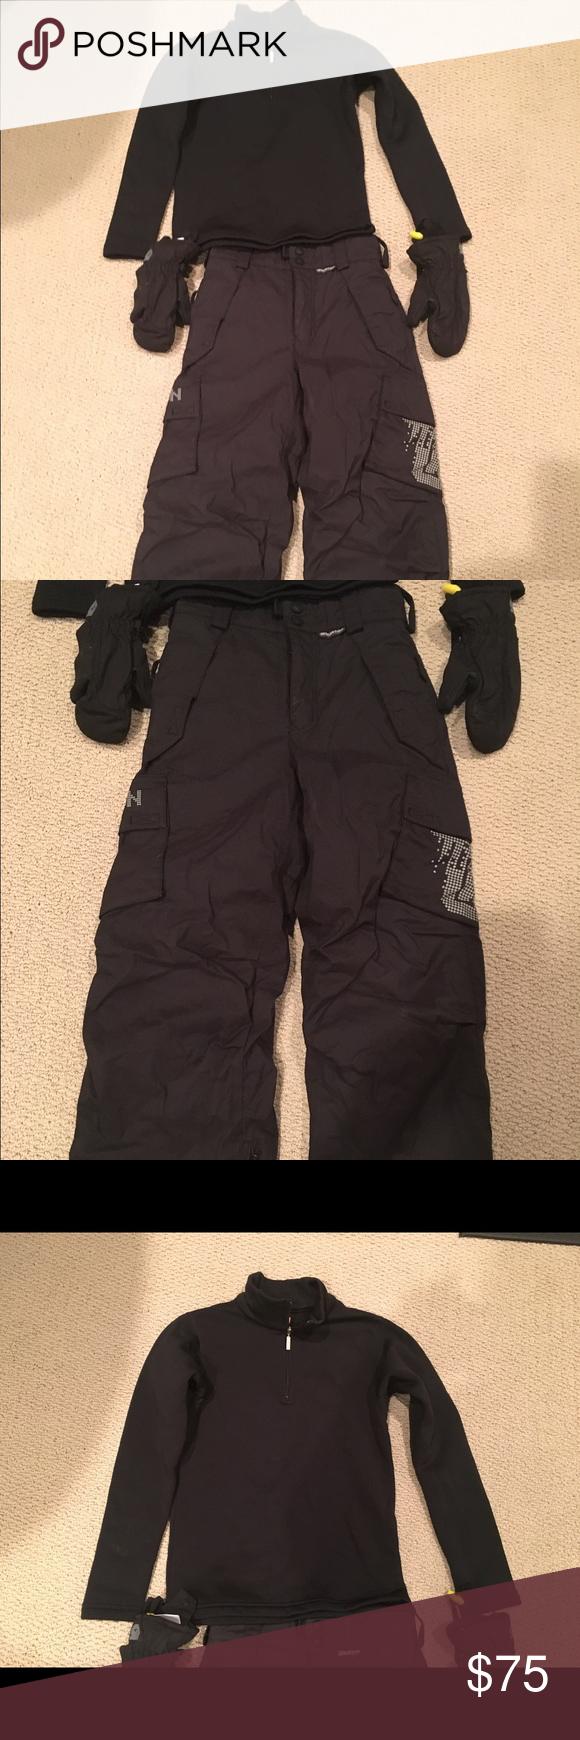 Boys Burton Snowboarding Pants Marker Jacket Boys Burton Black Snowboarding Ski Pants Size X Small 6 And Marker Sweater Boys Jacket Ski Pants Kids Mittens